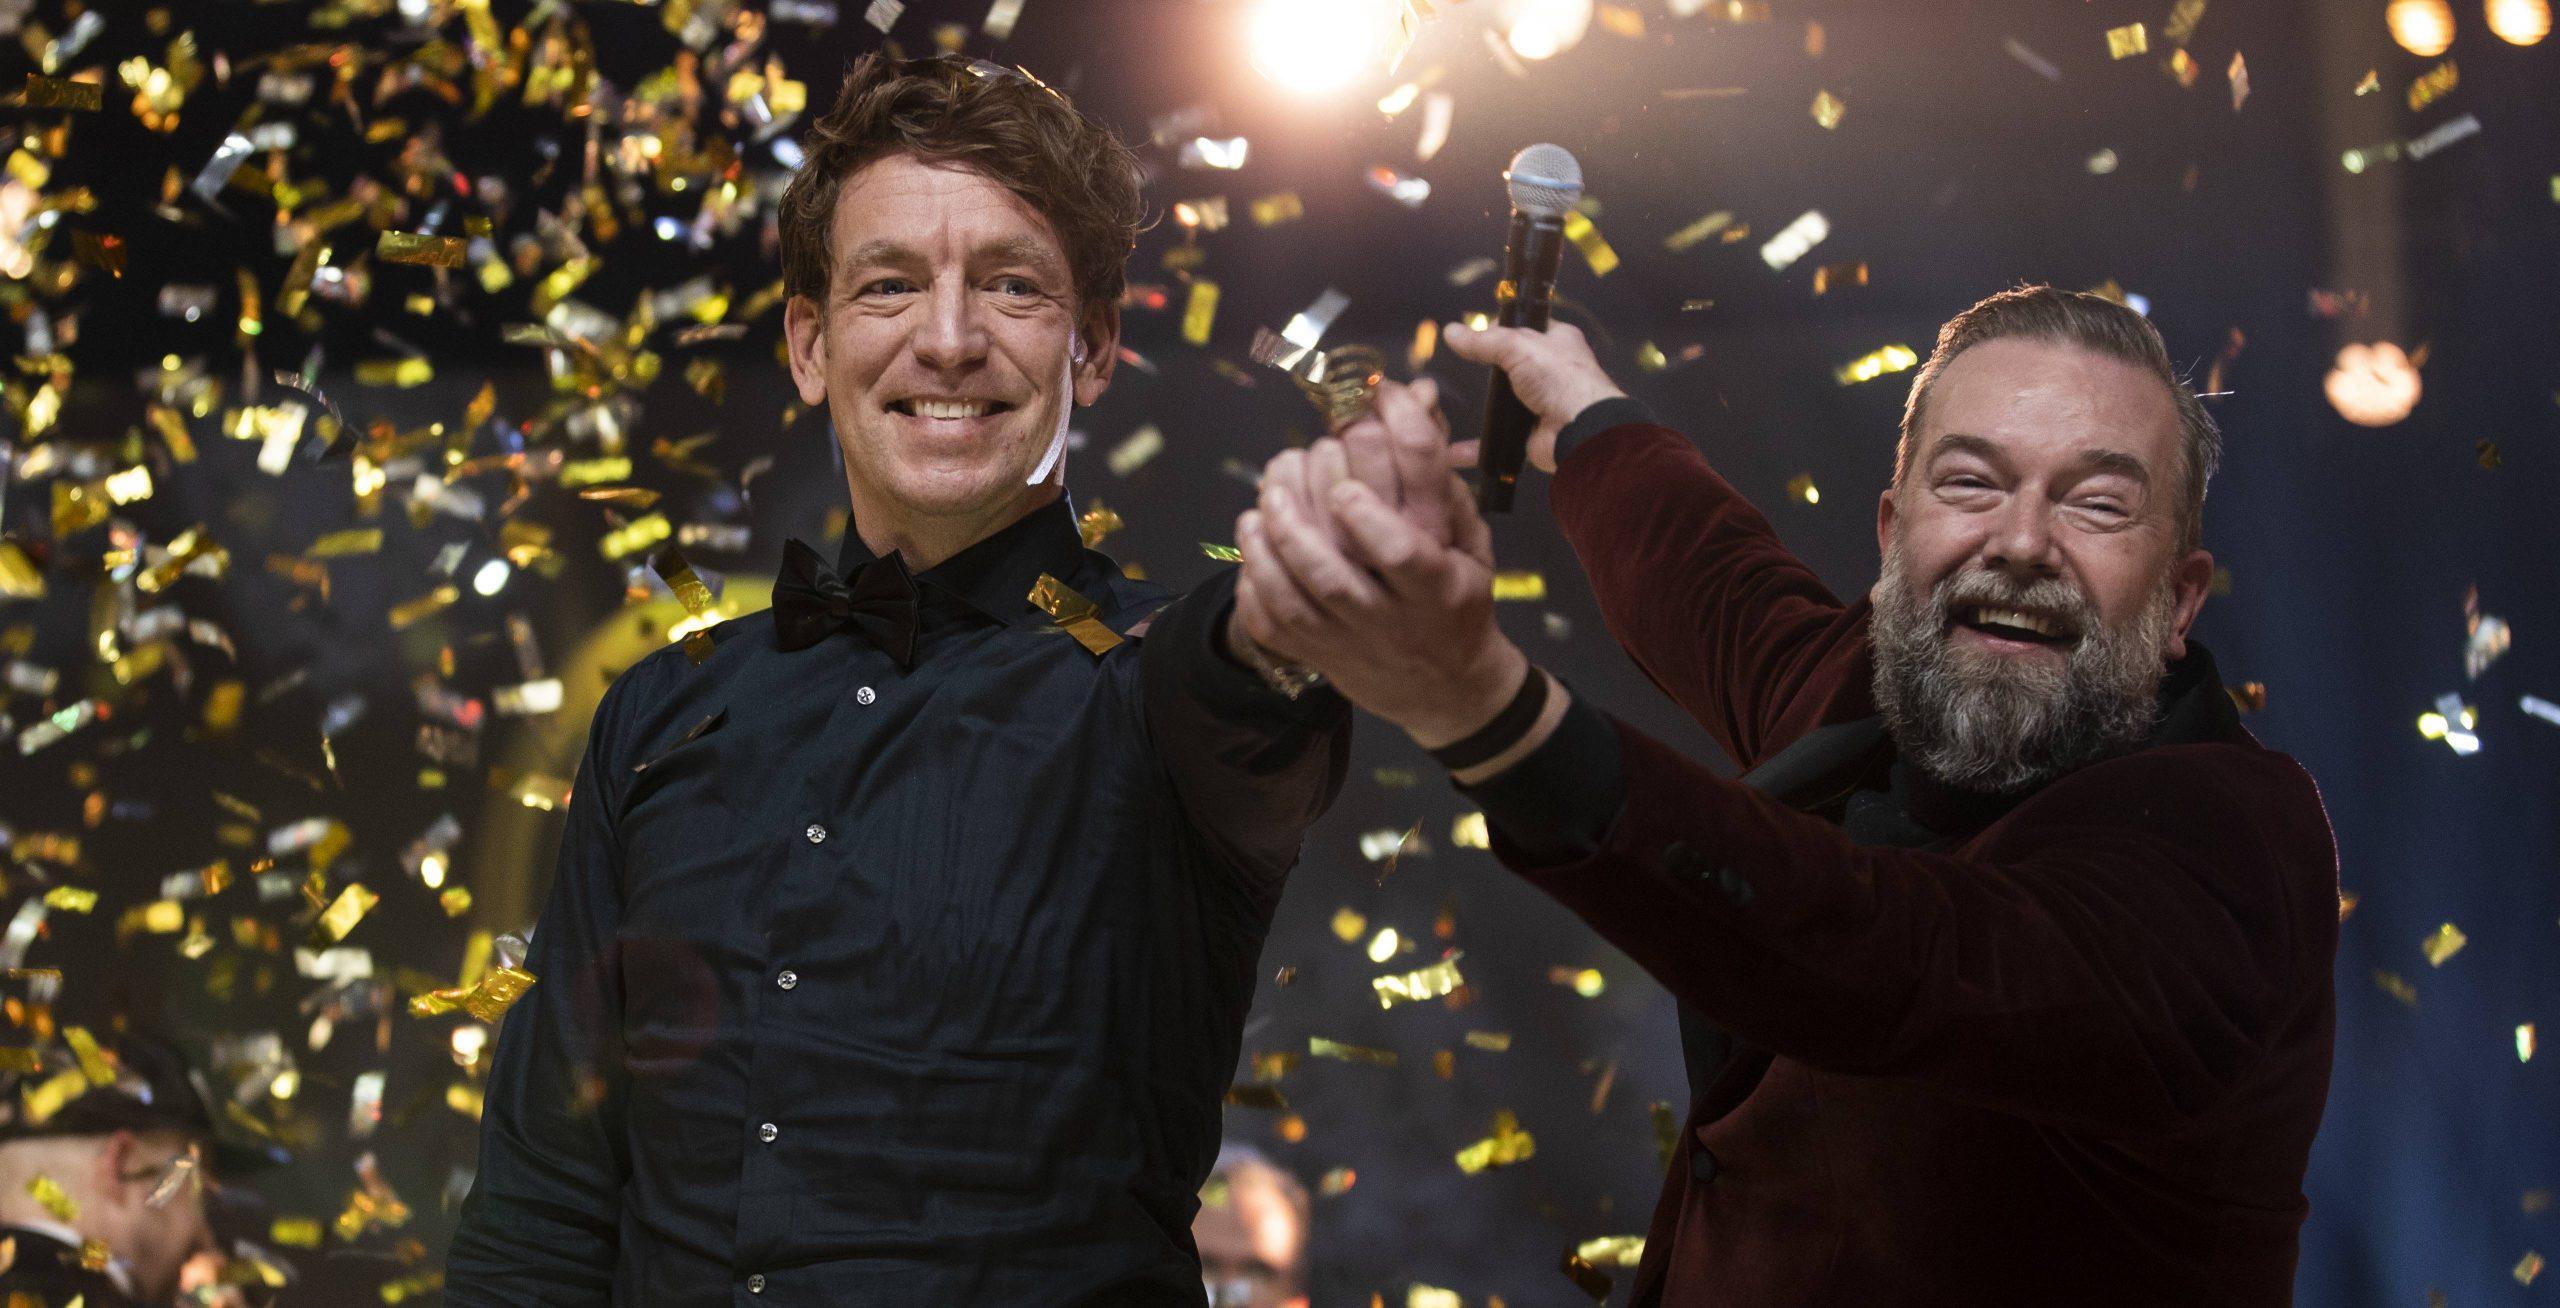 Jan-Willem Start Op wint Gouden Radioring 2020